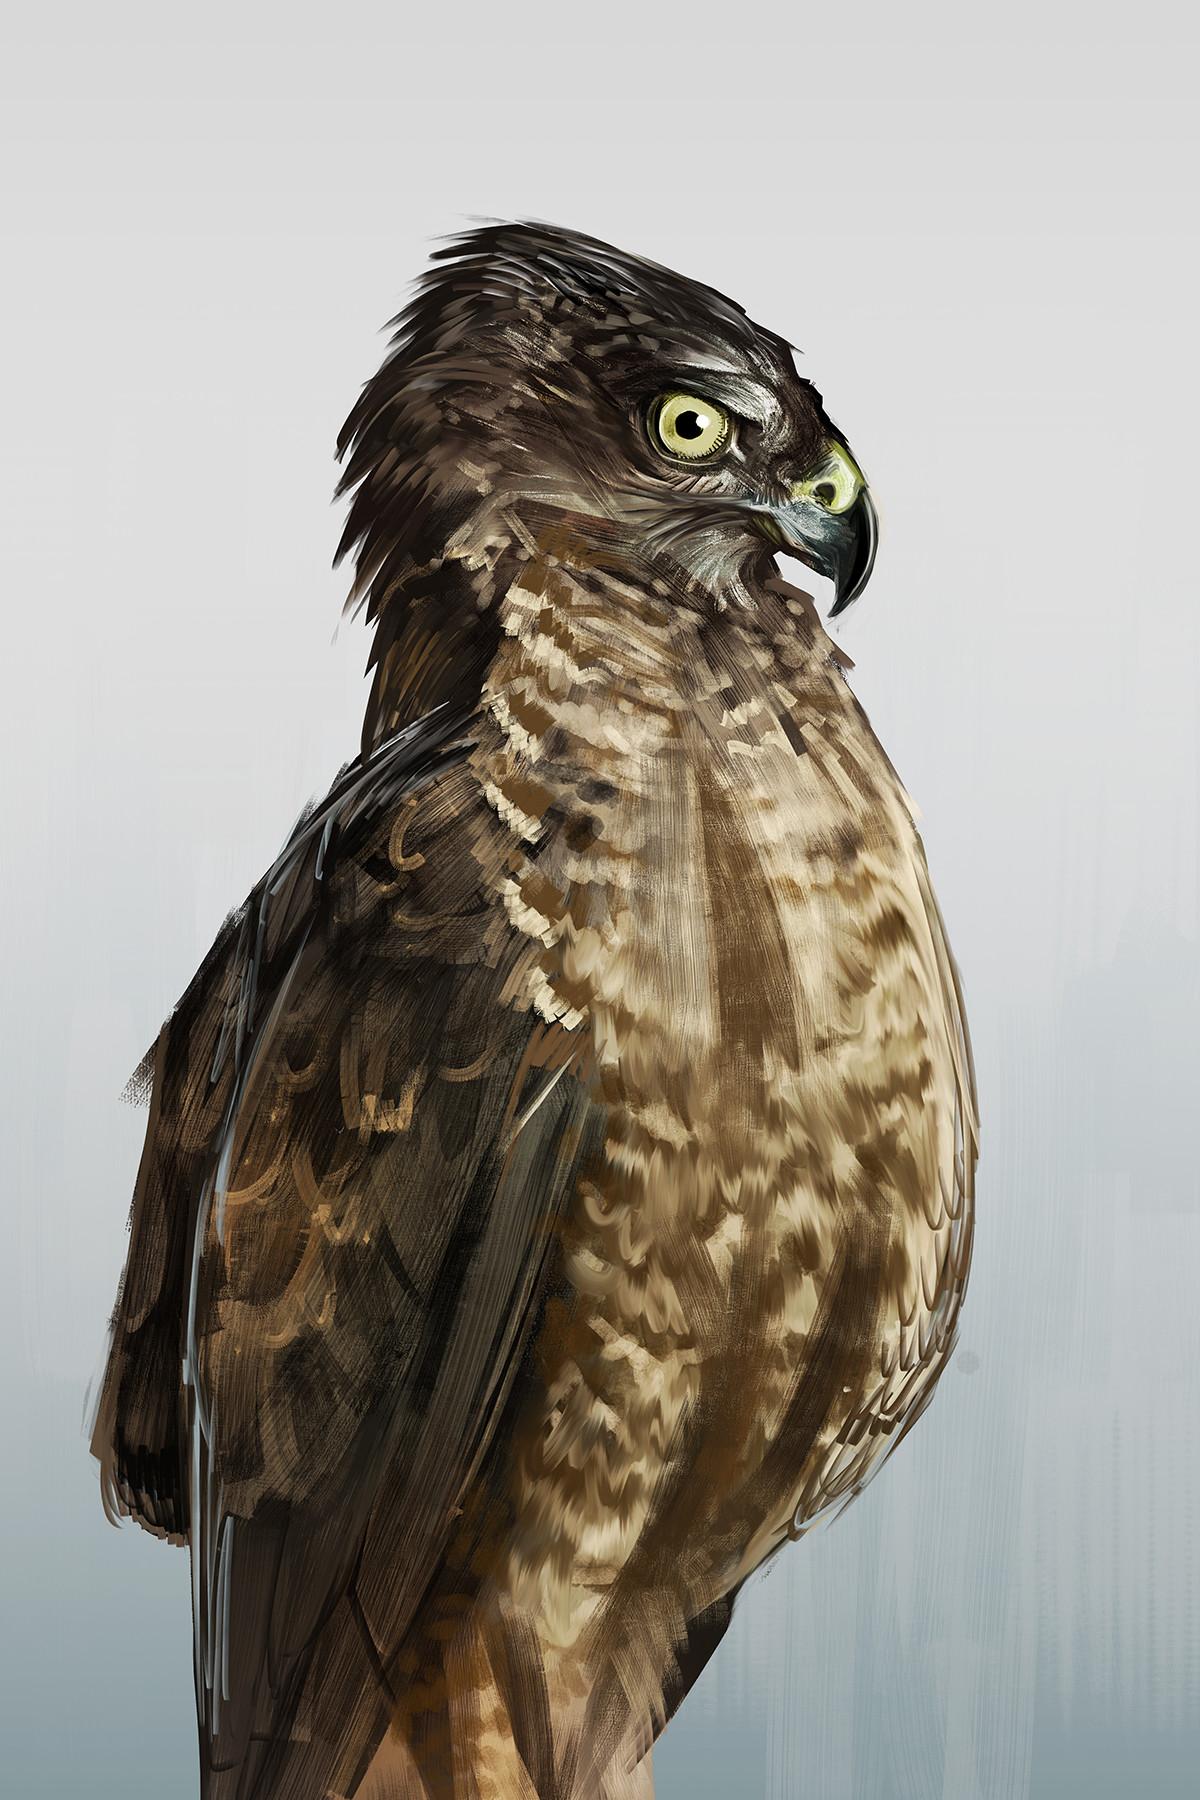 http://mymodernmet.com/leila-jeffreys-colorful-bird-portraits-pigeons-doves/